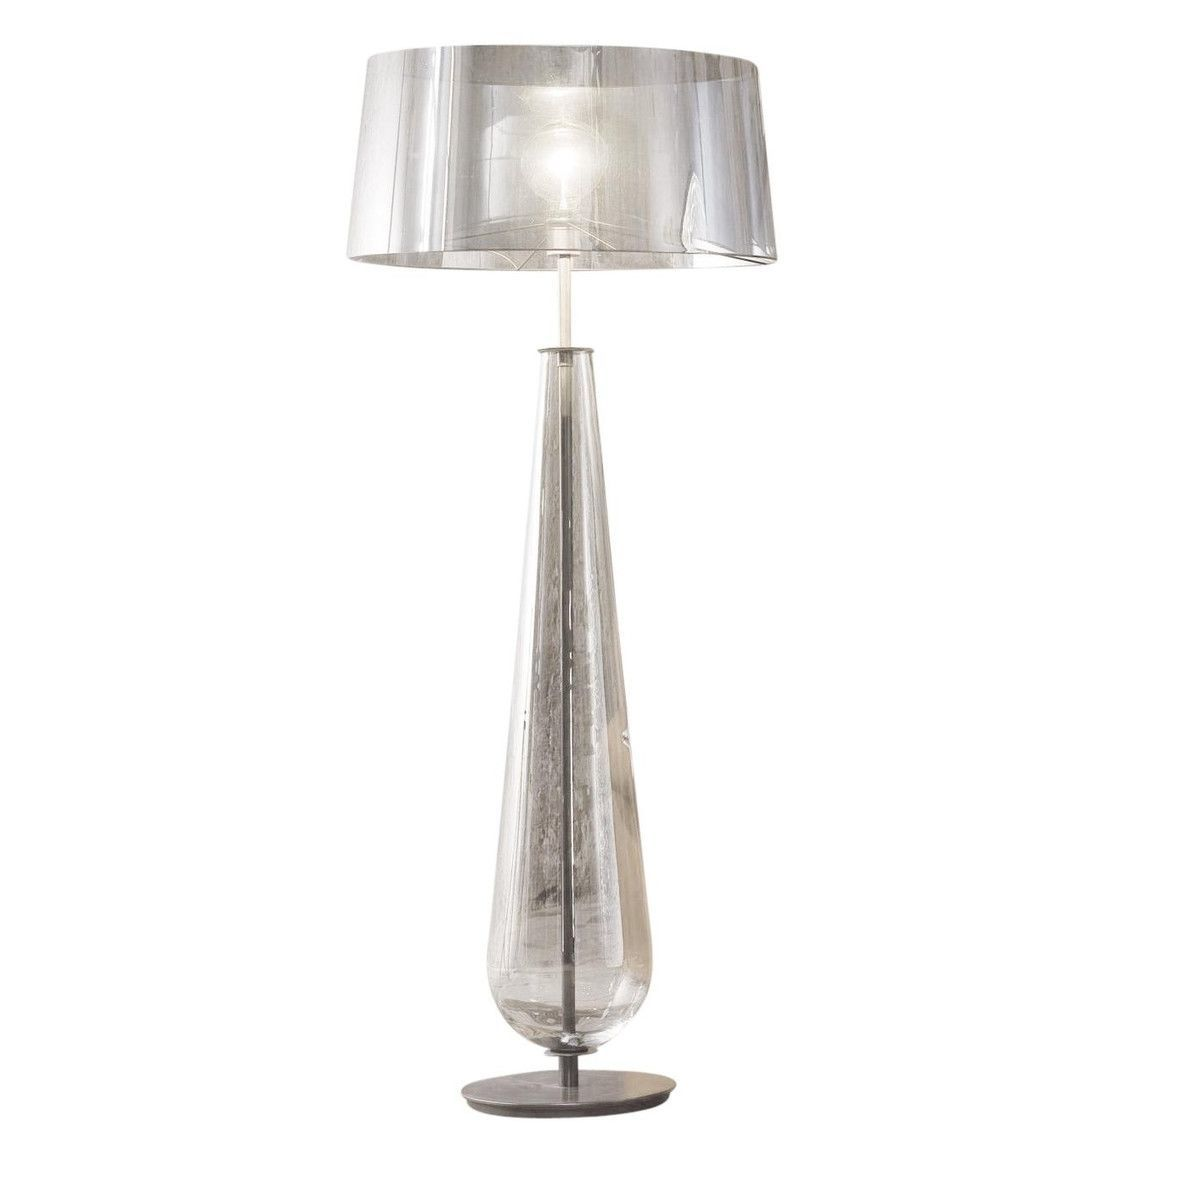 New classic bon ton floor lamp penta ambientedirectcom for Classic floor reading lamp